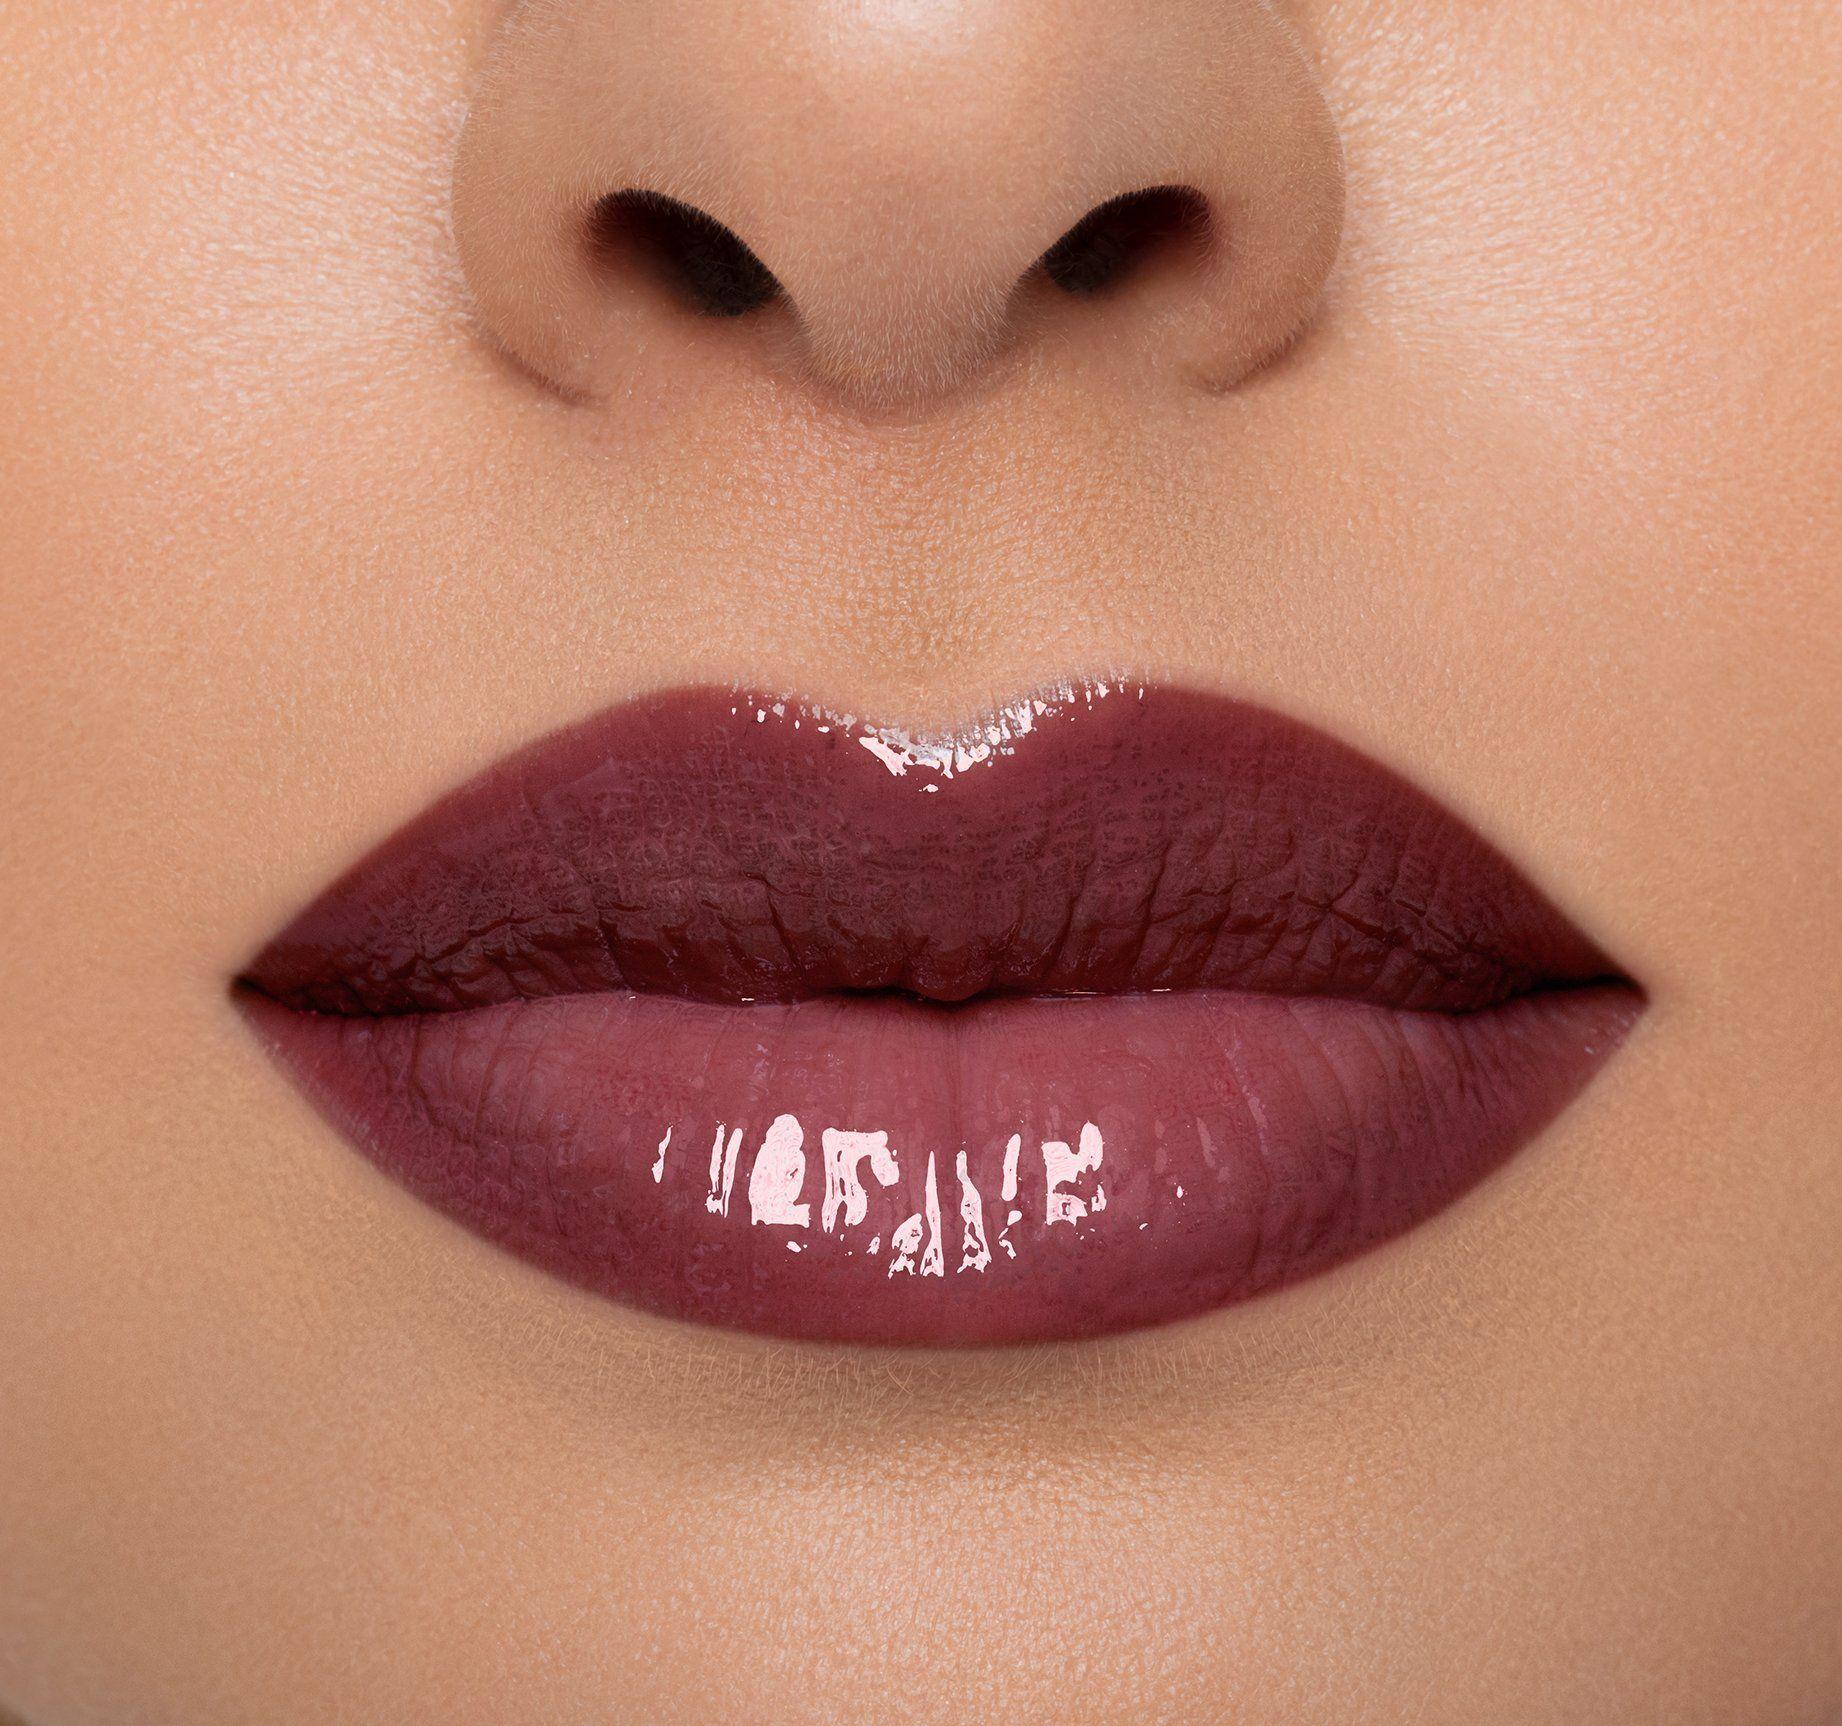 18 Gorgeous Lipstick Shades For This Season - beautiful lip makeup ,lipstick color ,lip arts #lipstick #lipmakeup #mattelip #lipgloss #makeup